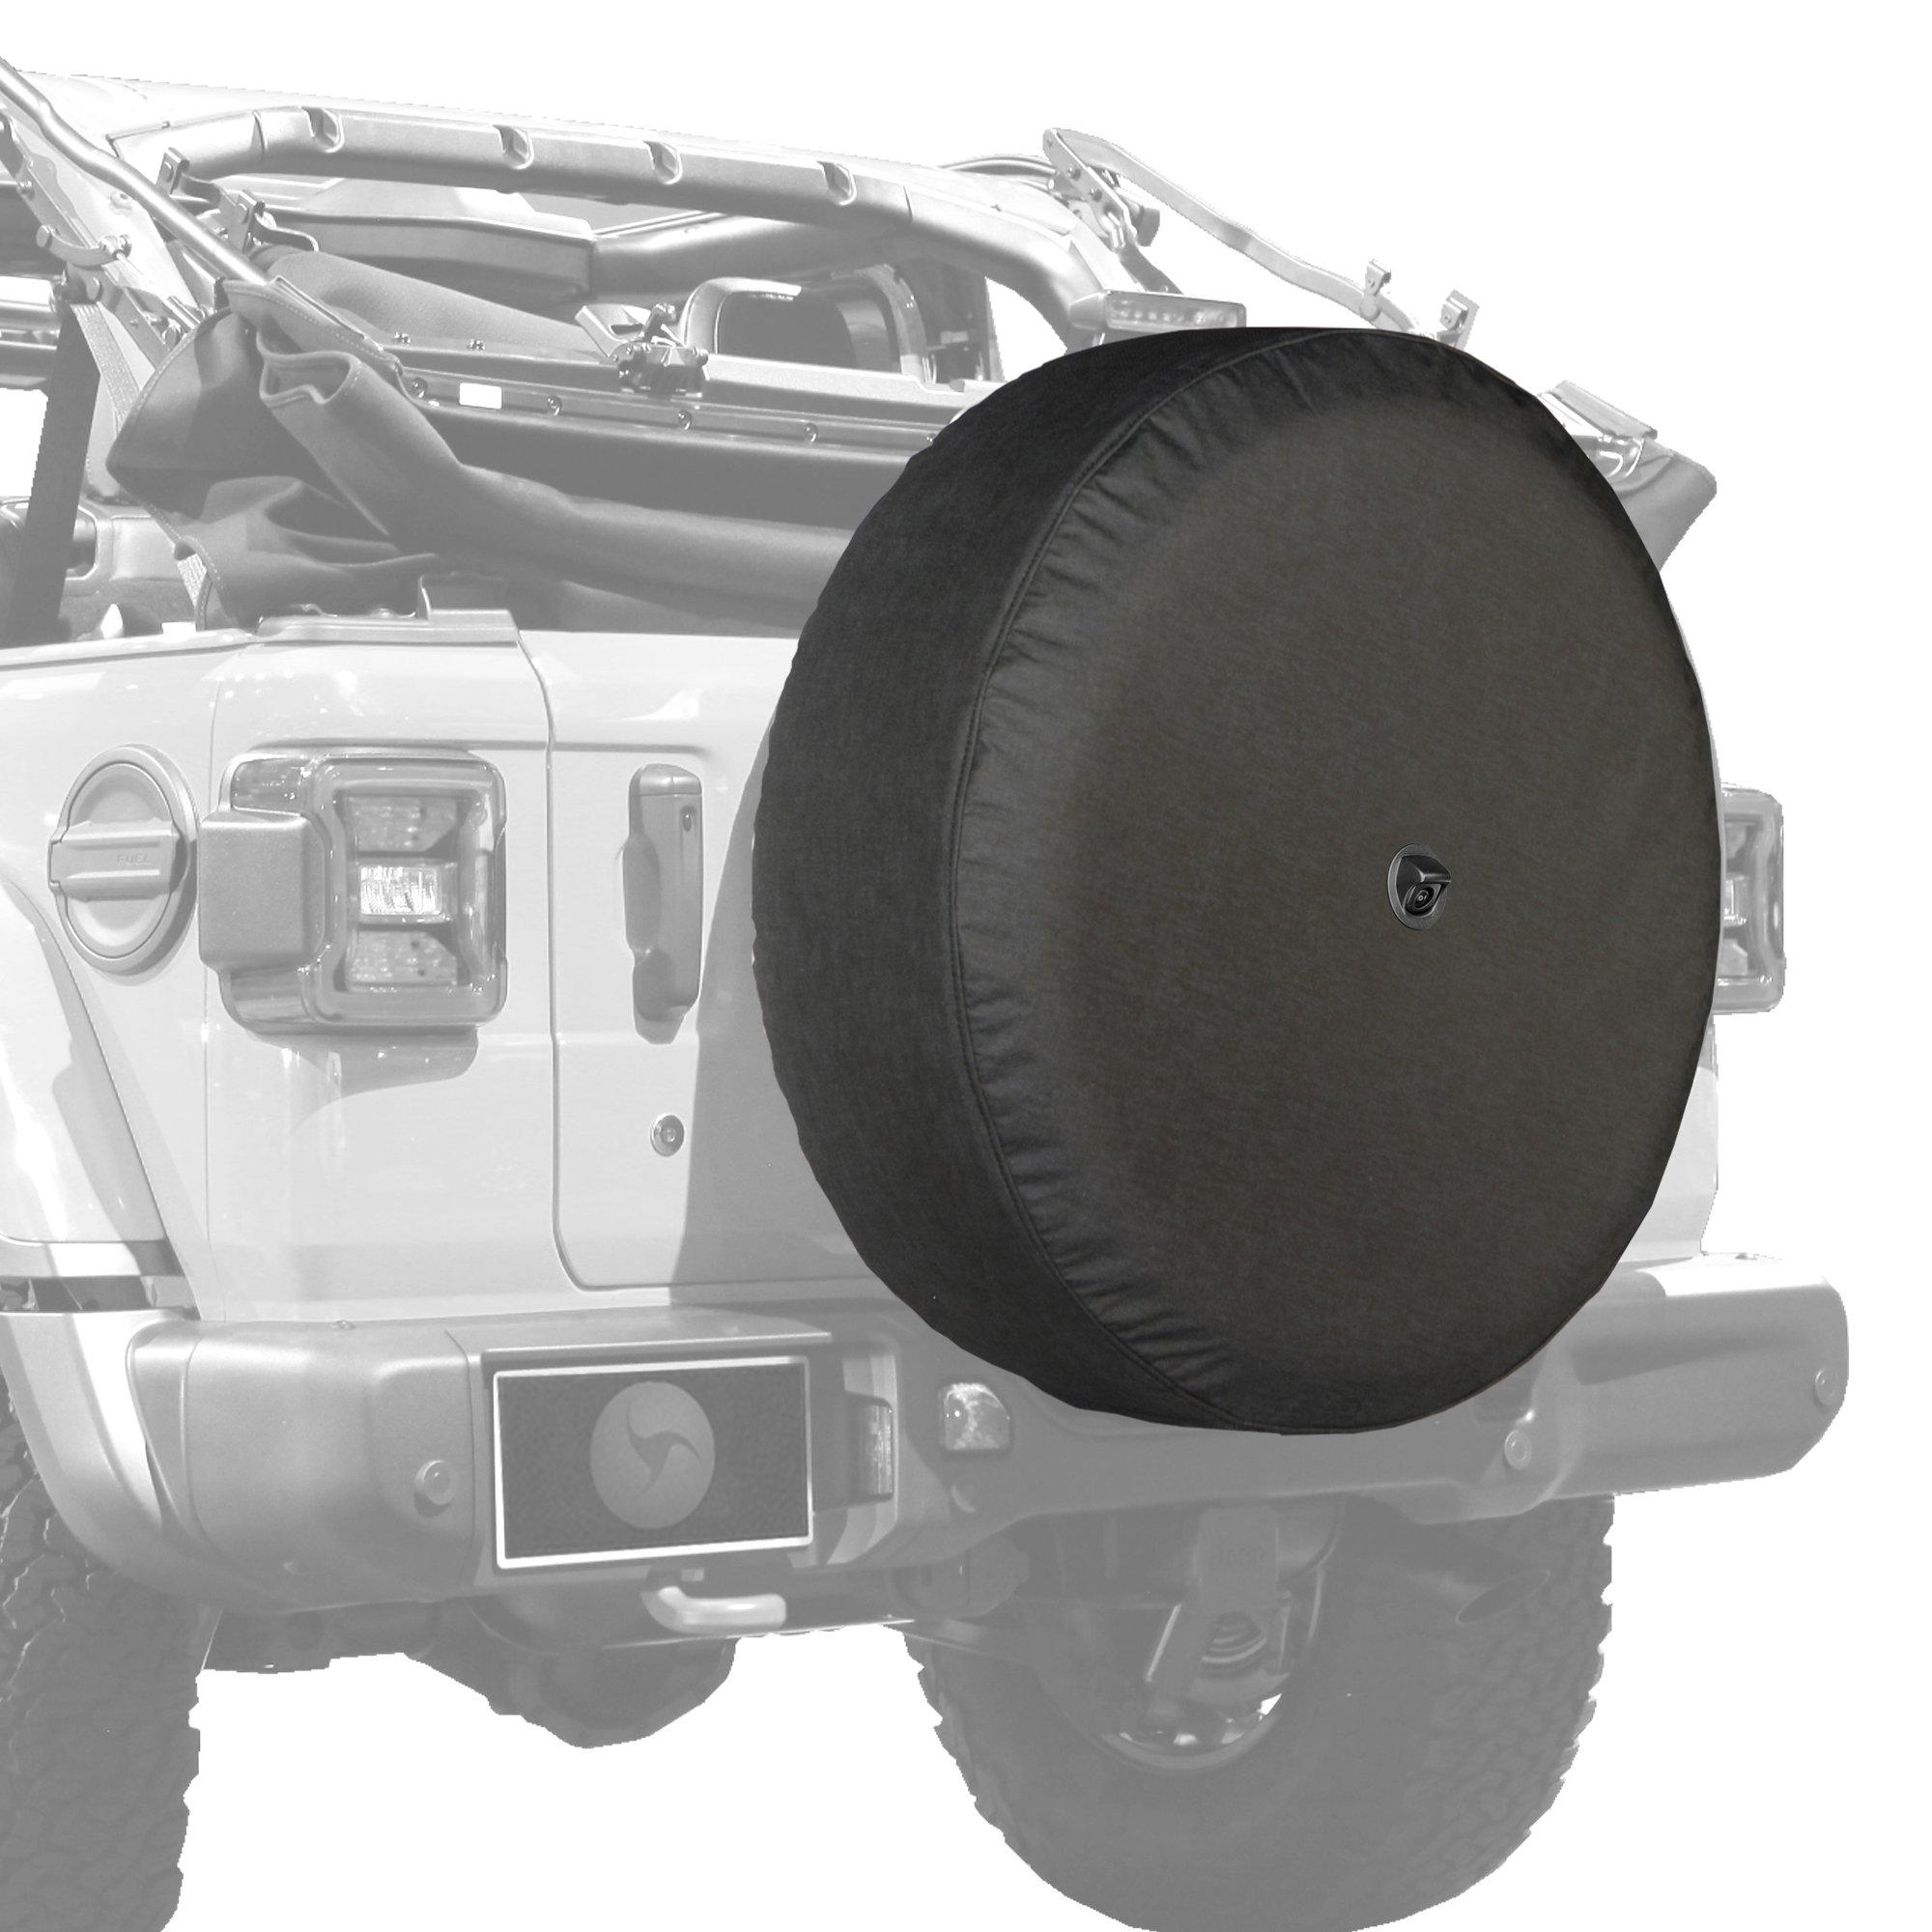 Jeep Wrangler Rubicon JL & JLU - 33'' Soft Tire Cover - Black Denim Vinyl w/Molded Camera Hood